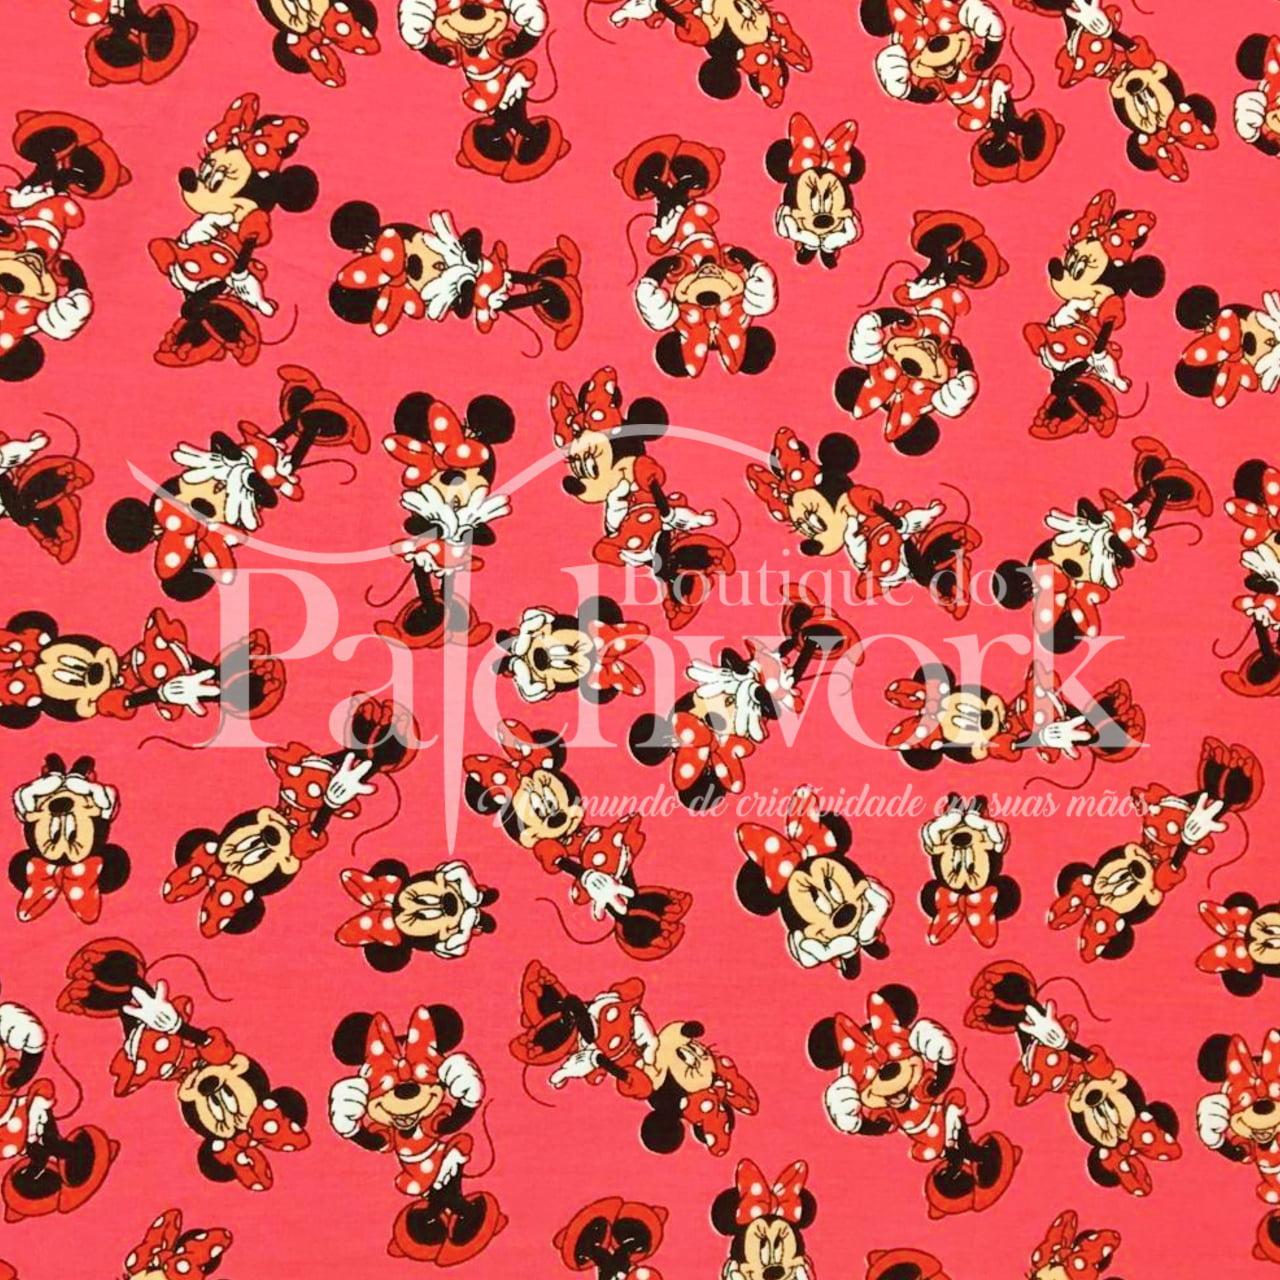 Tecido Minnie Mouse fd. Rosa (50cm x 1,50m)